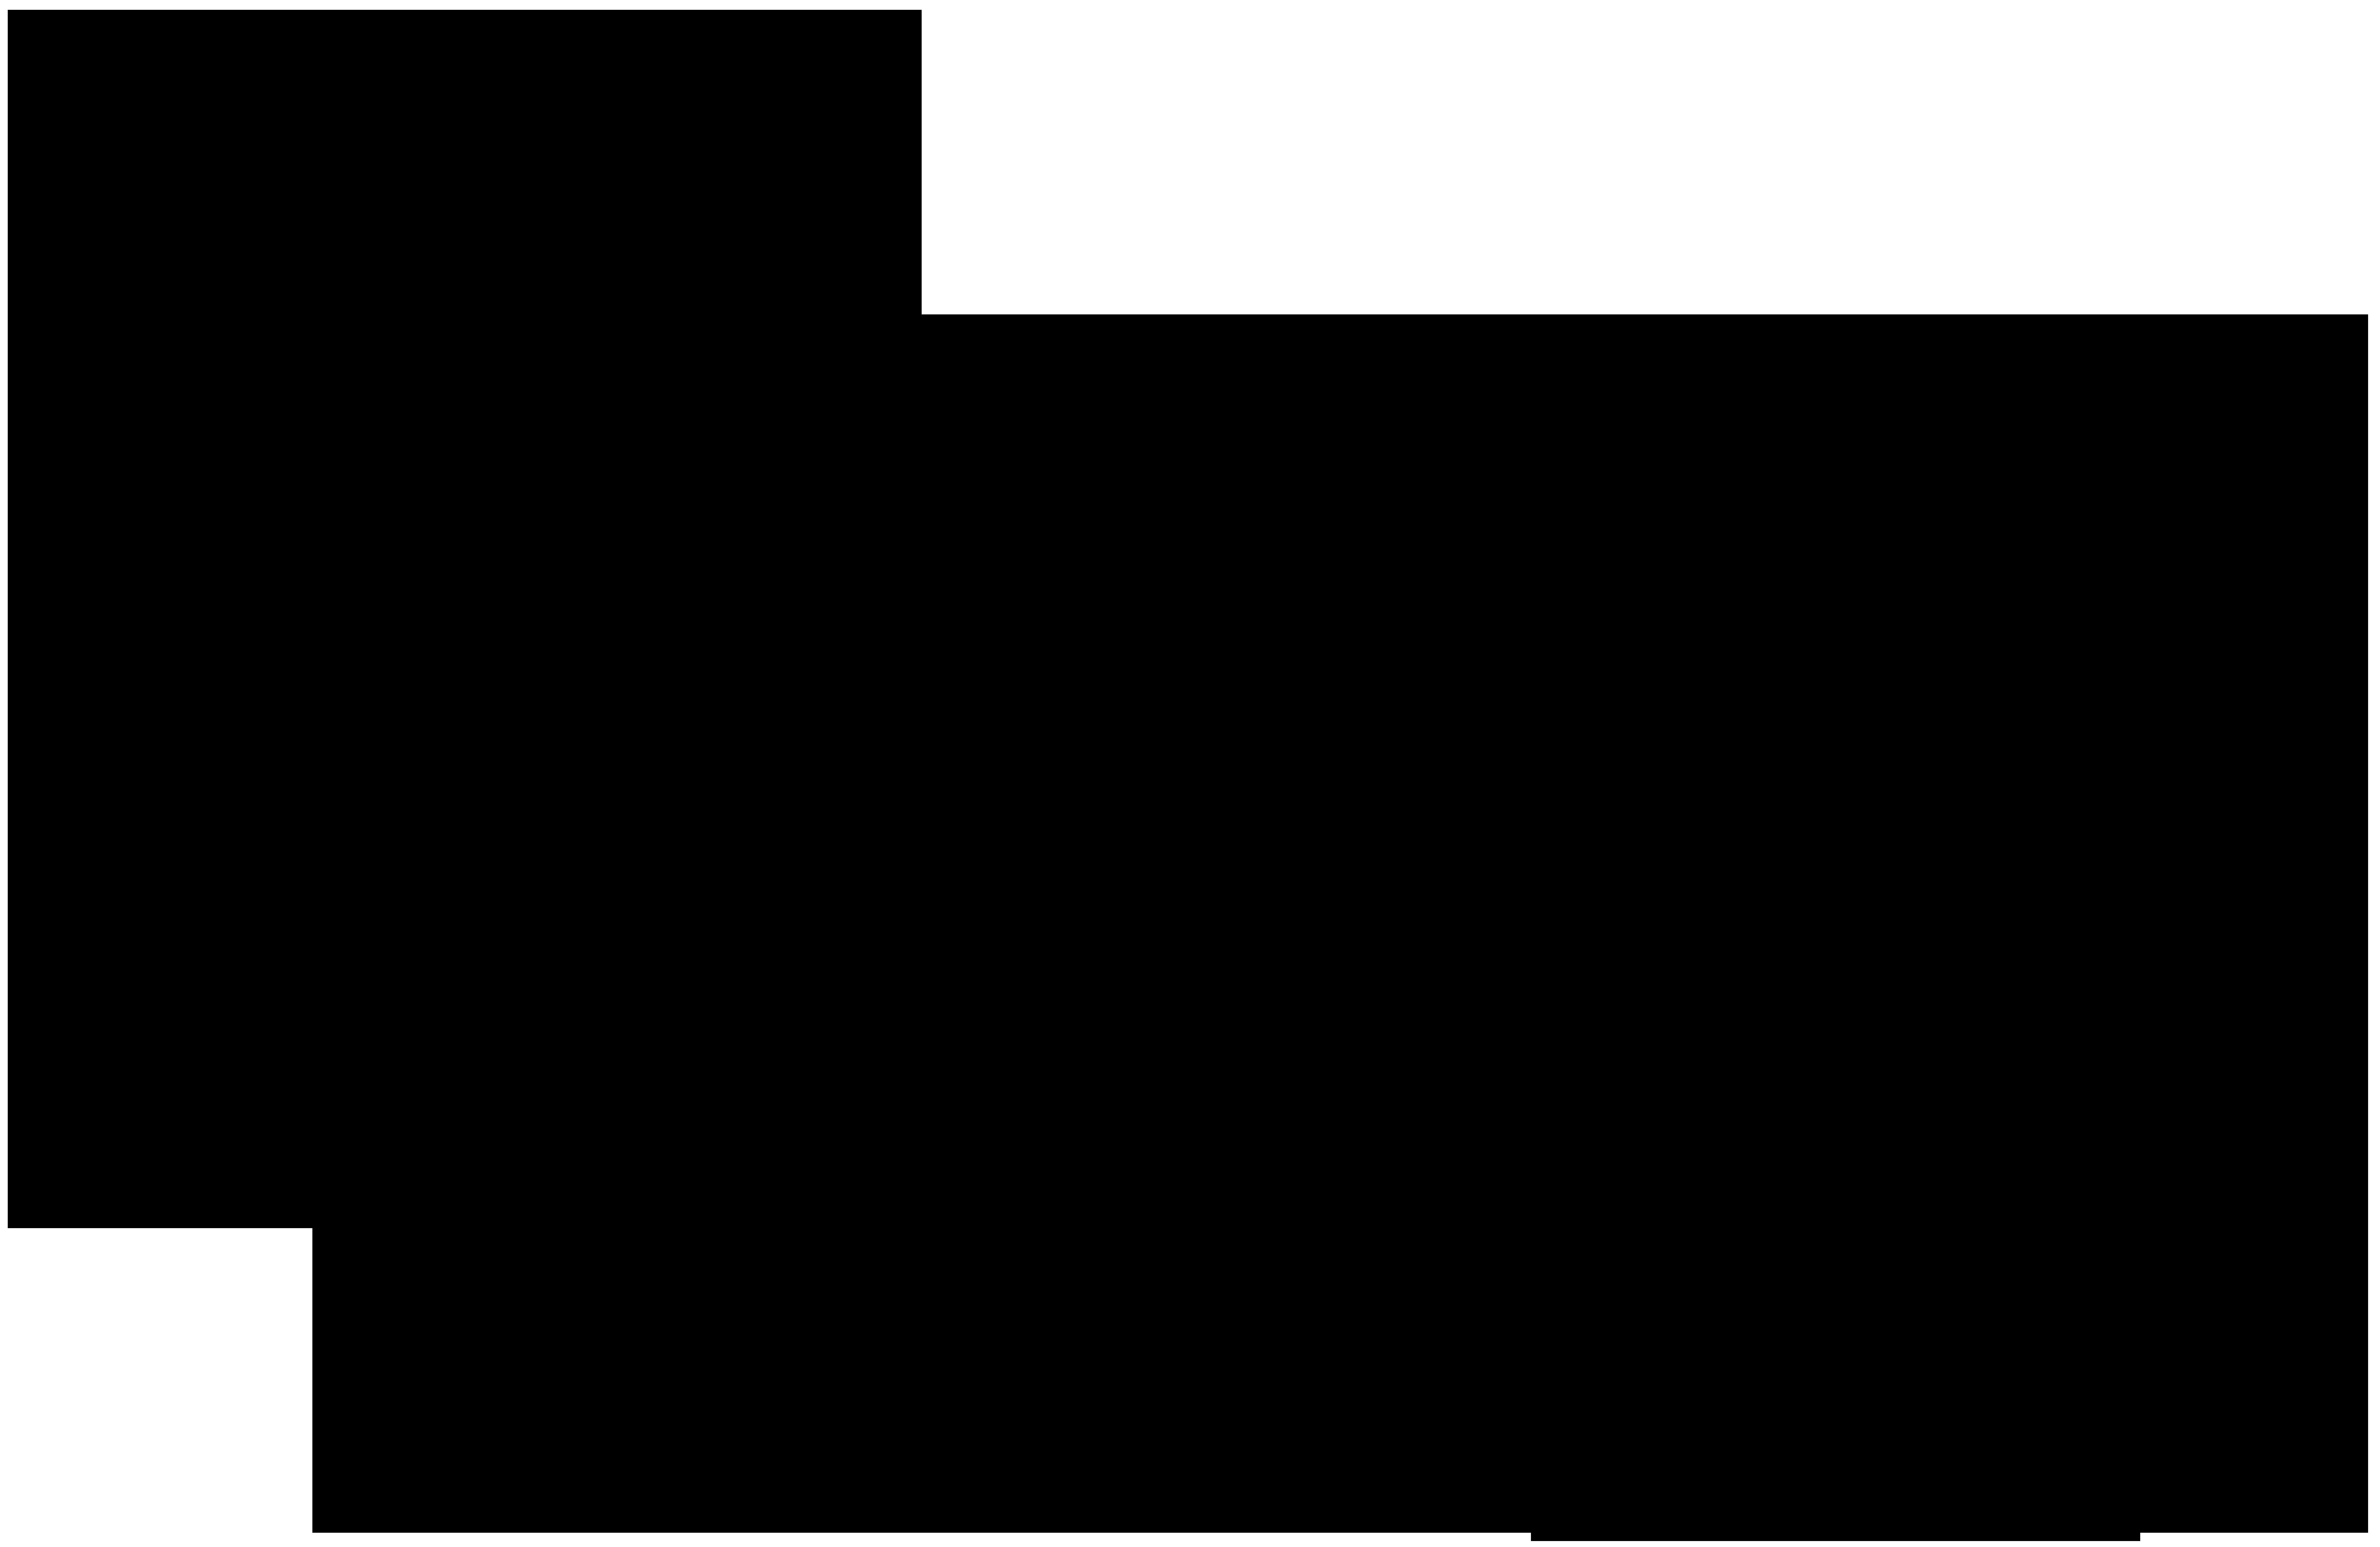 8000x5201 Hippopotamus Silhouette Png Clip Art Imageu200b Gallery Yopriceville